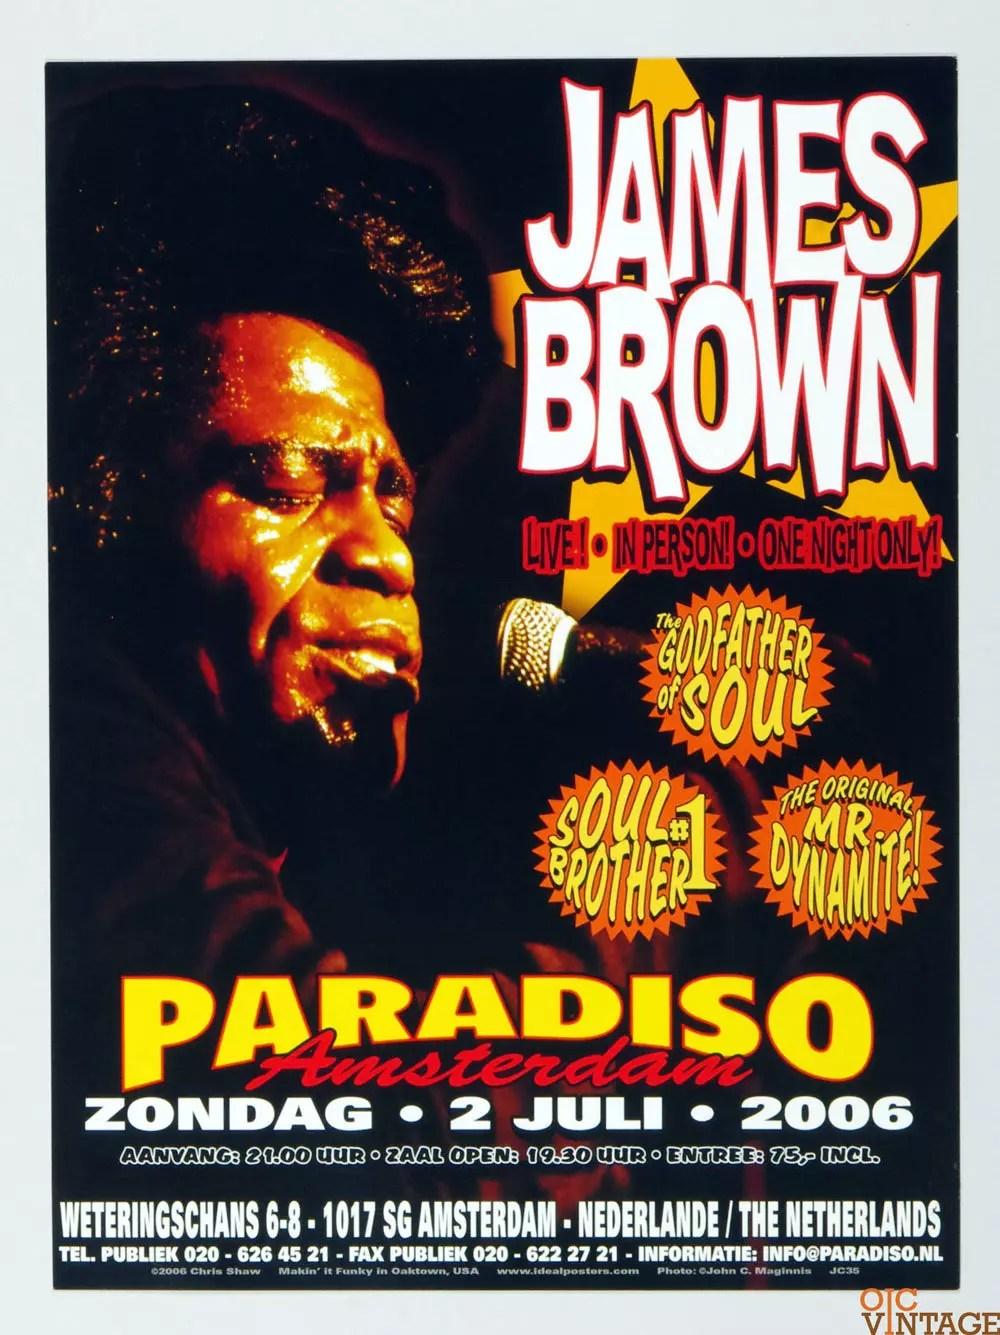 James Brown Poster 2006 Jul 2 Paradiso Amsterdam Chris Shaw